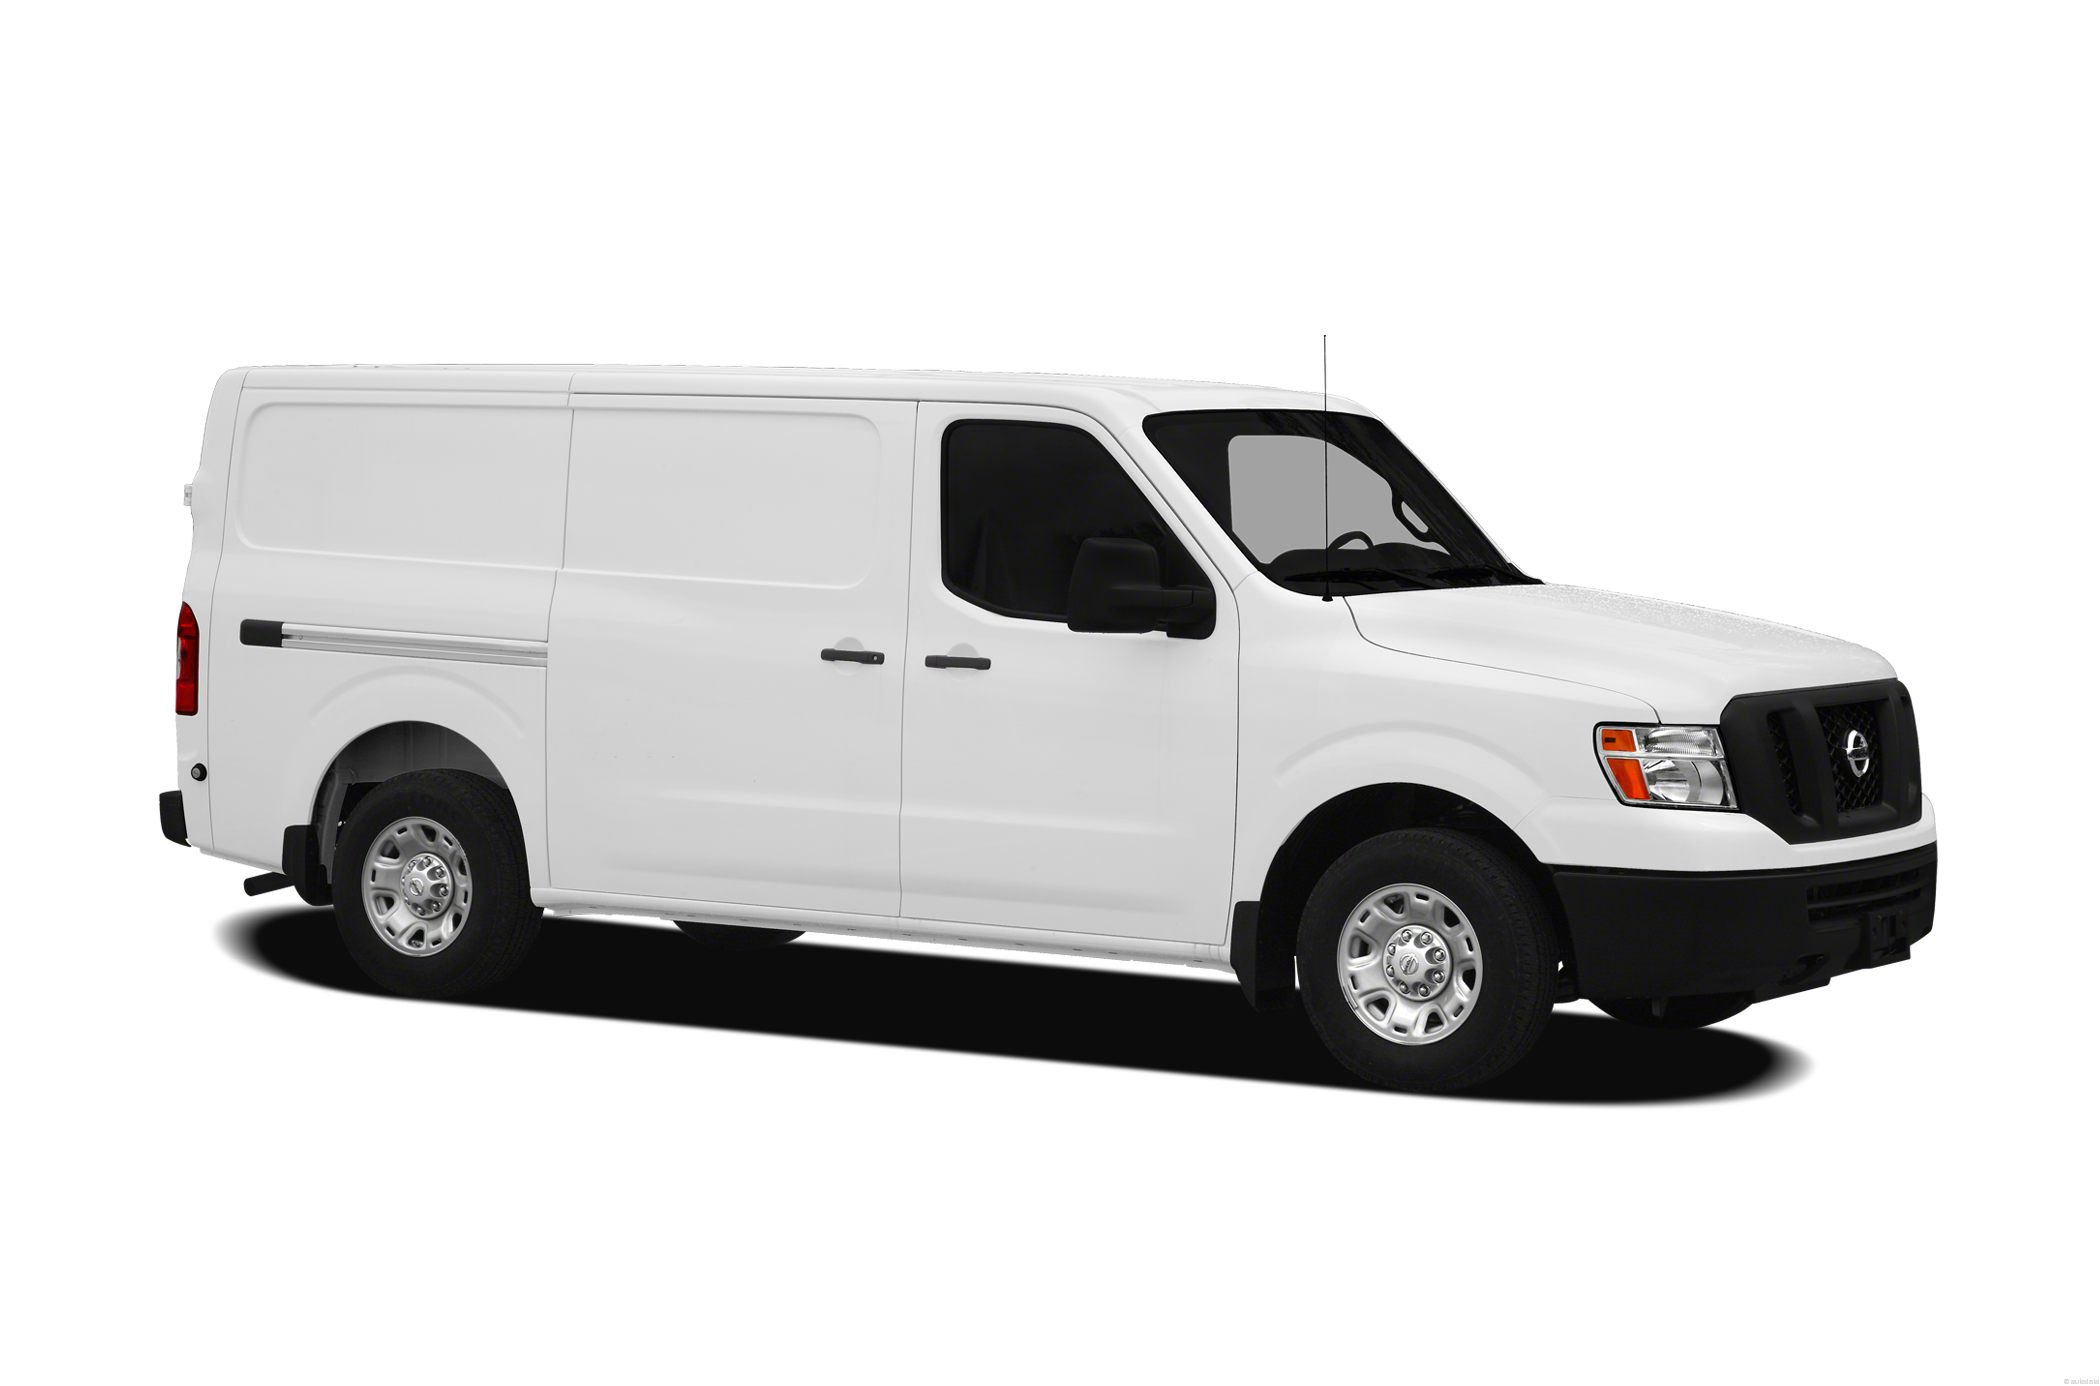 2012 Nissan Nv Image 3